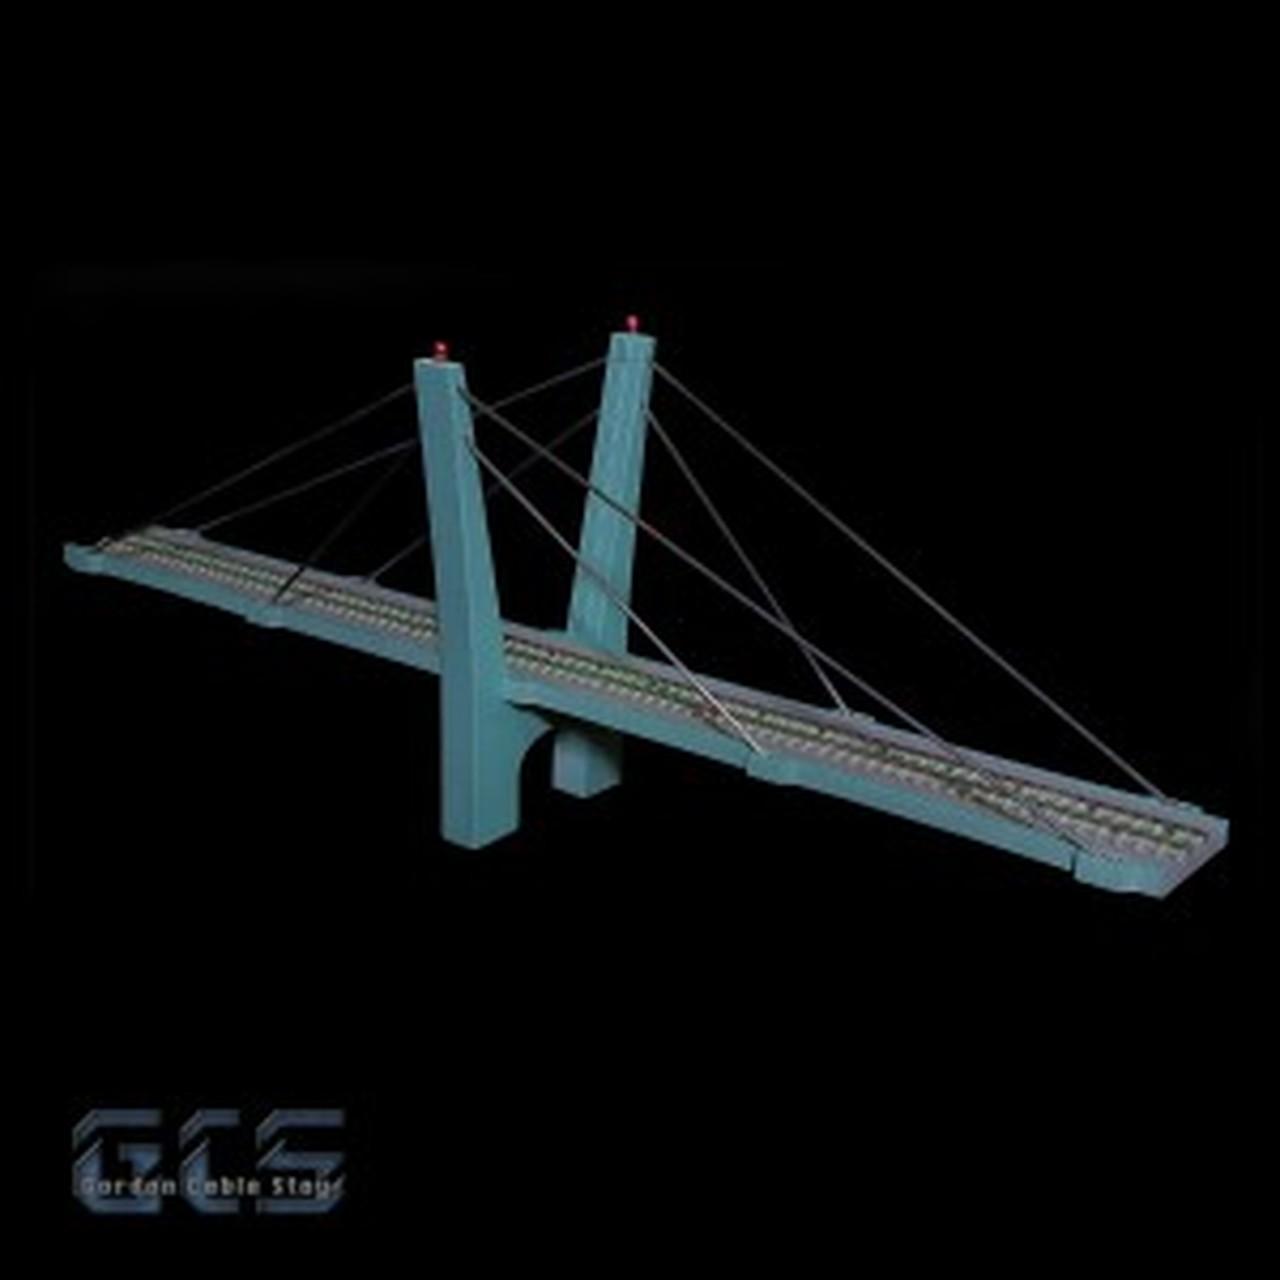 N Scale - Gordon Cable Stay - CS15-NZ - Bridge - Bridges and Piers